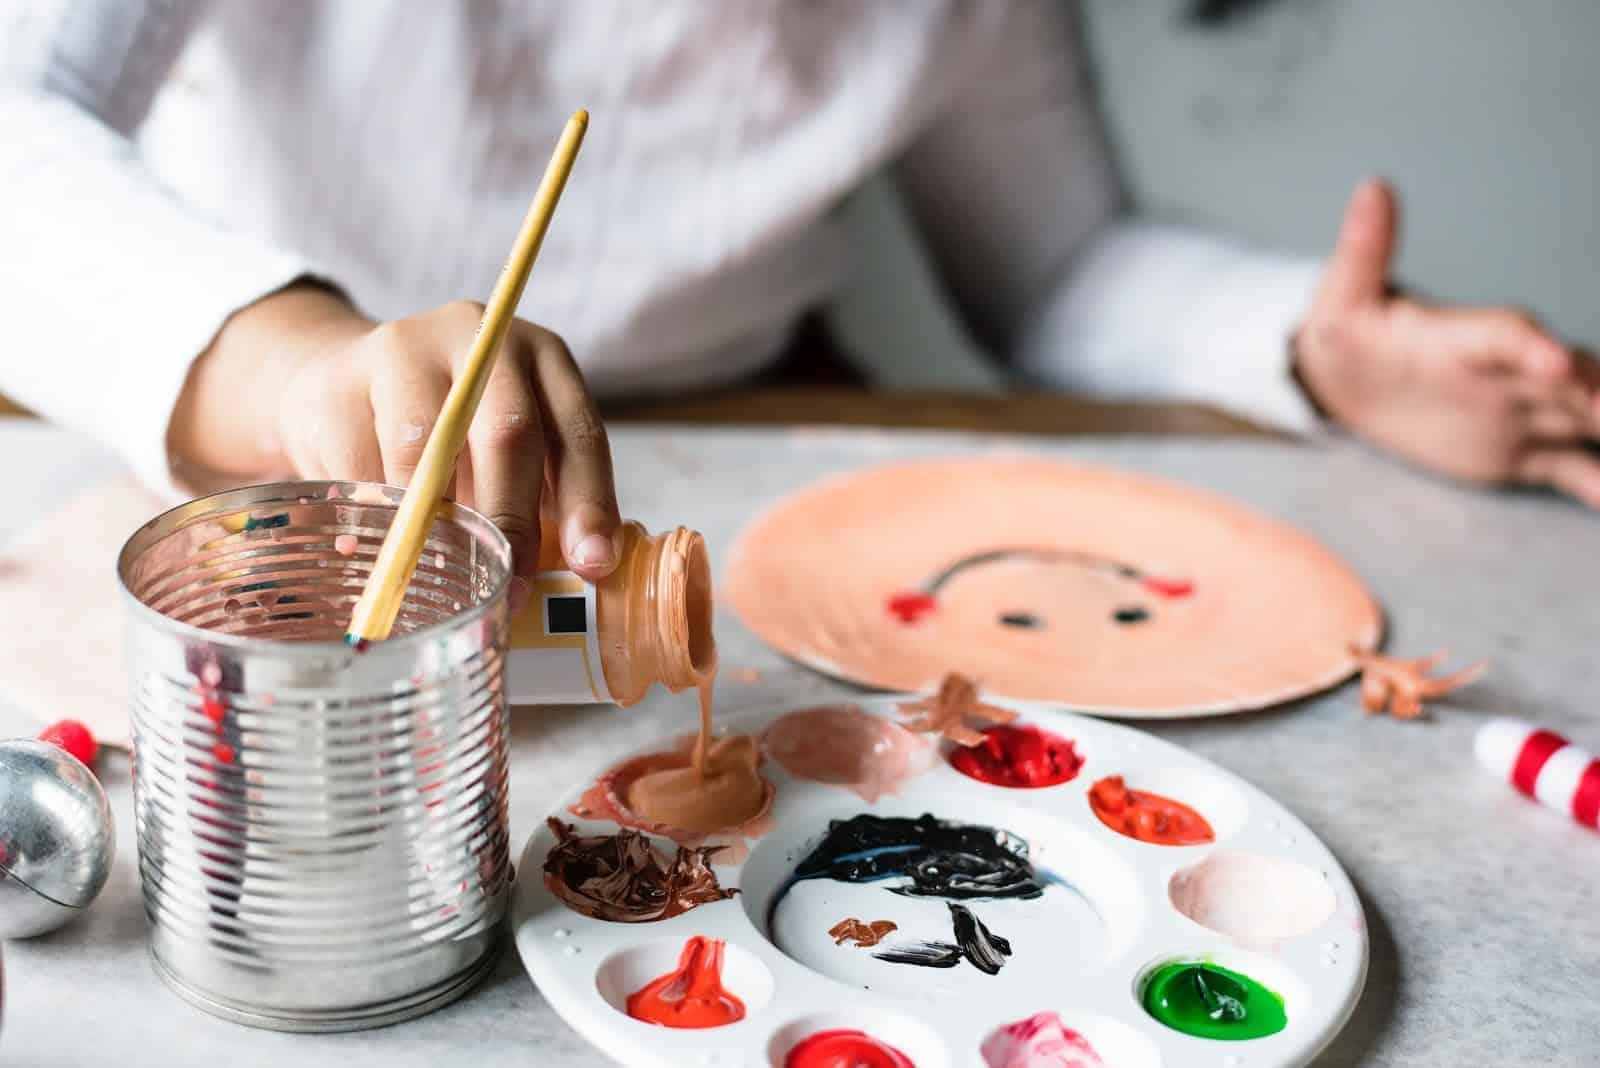 activities for kids to enjoy